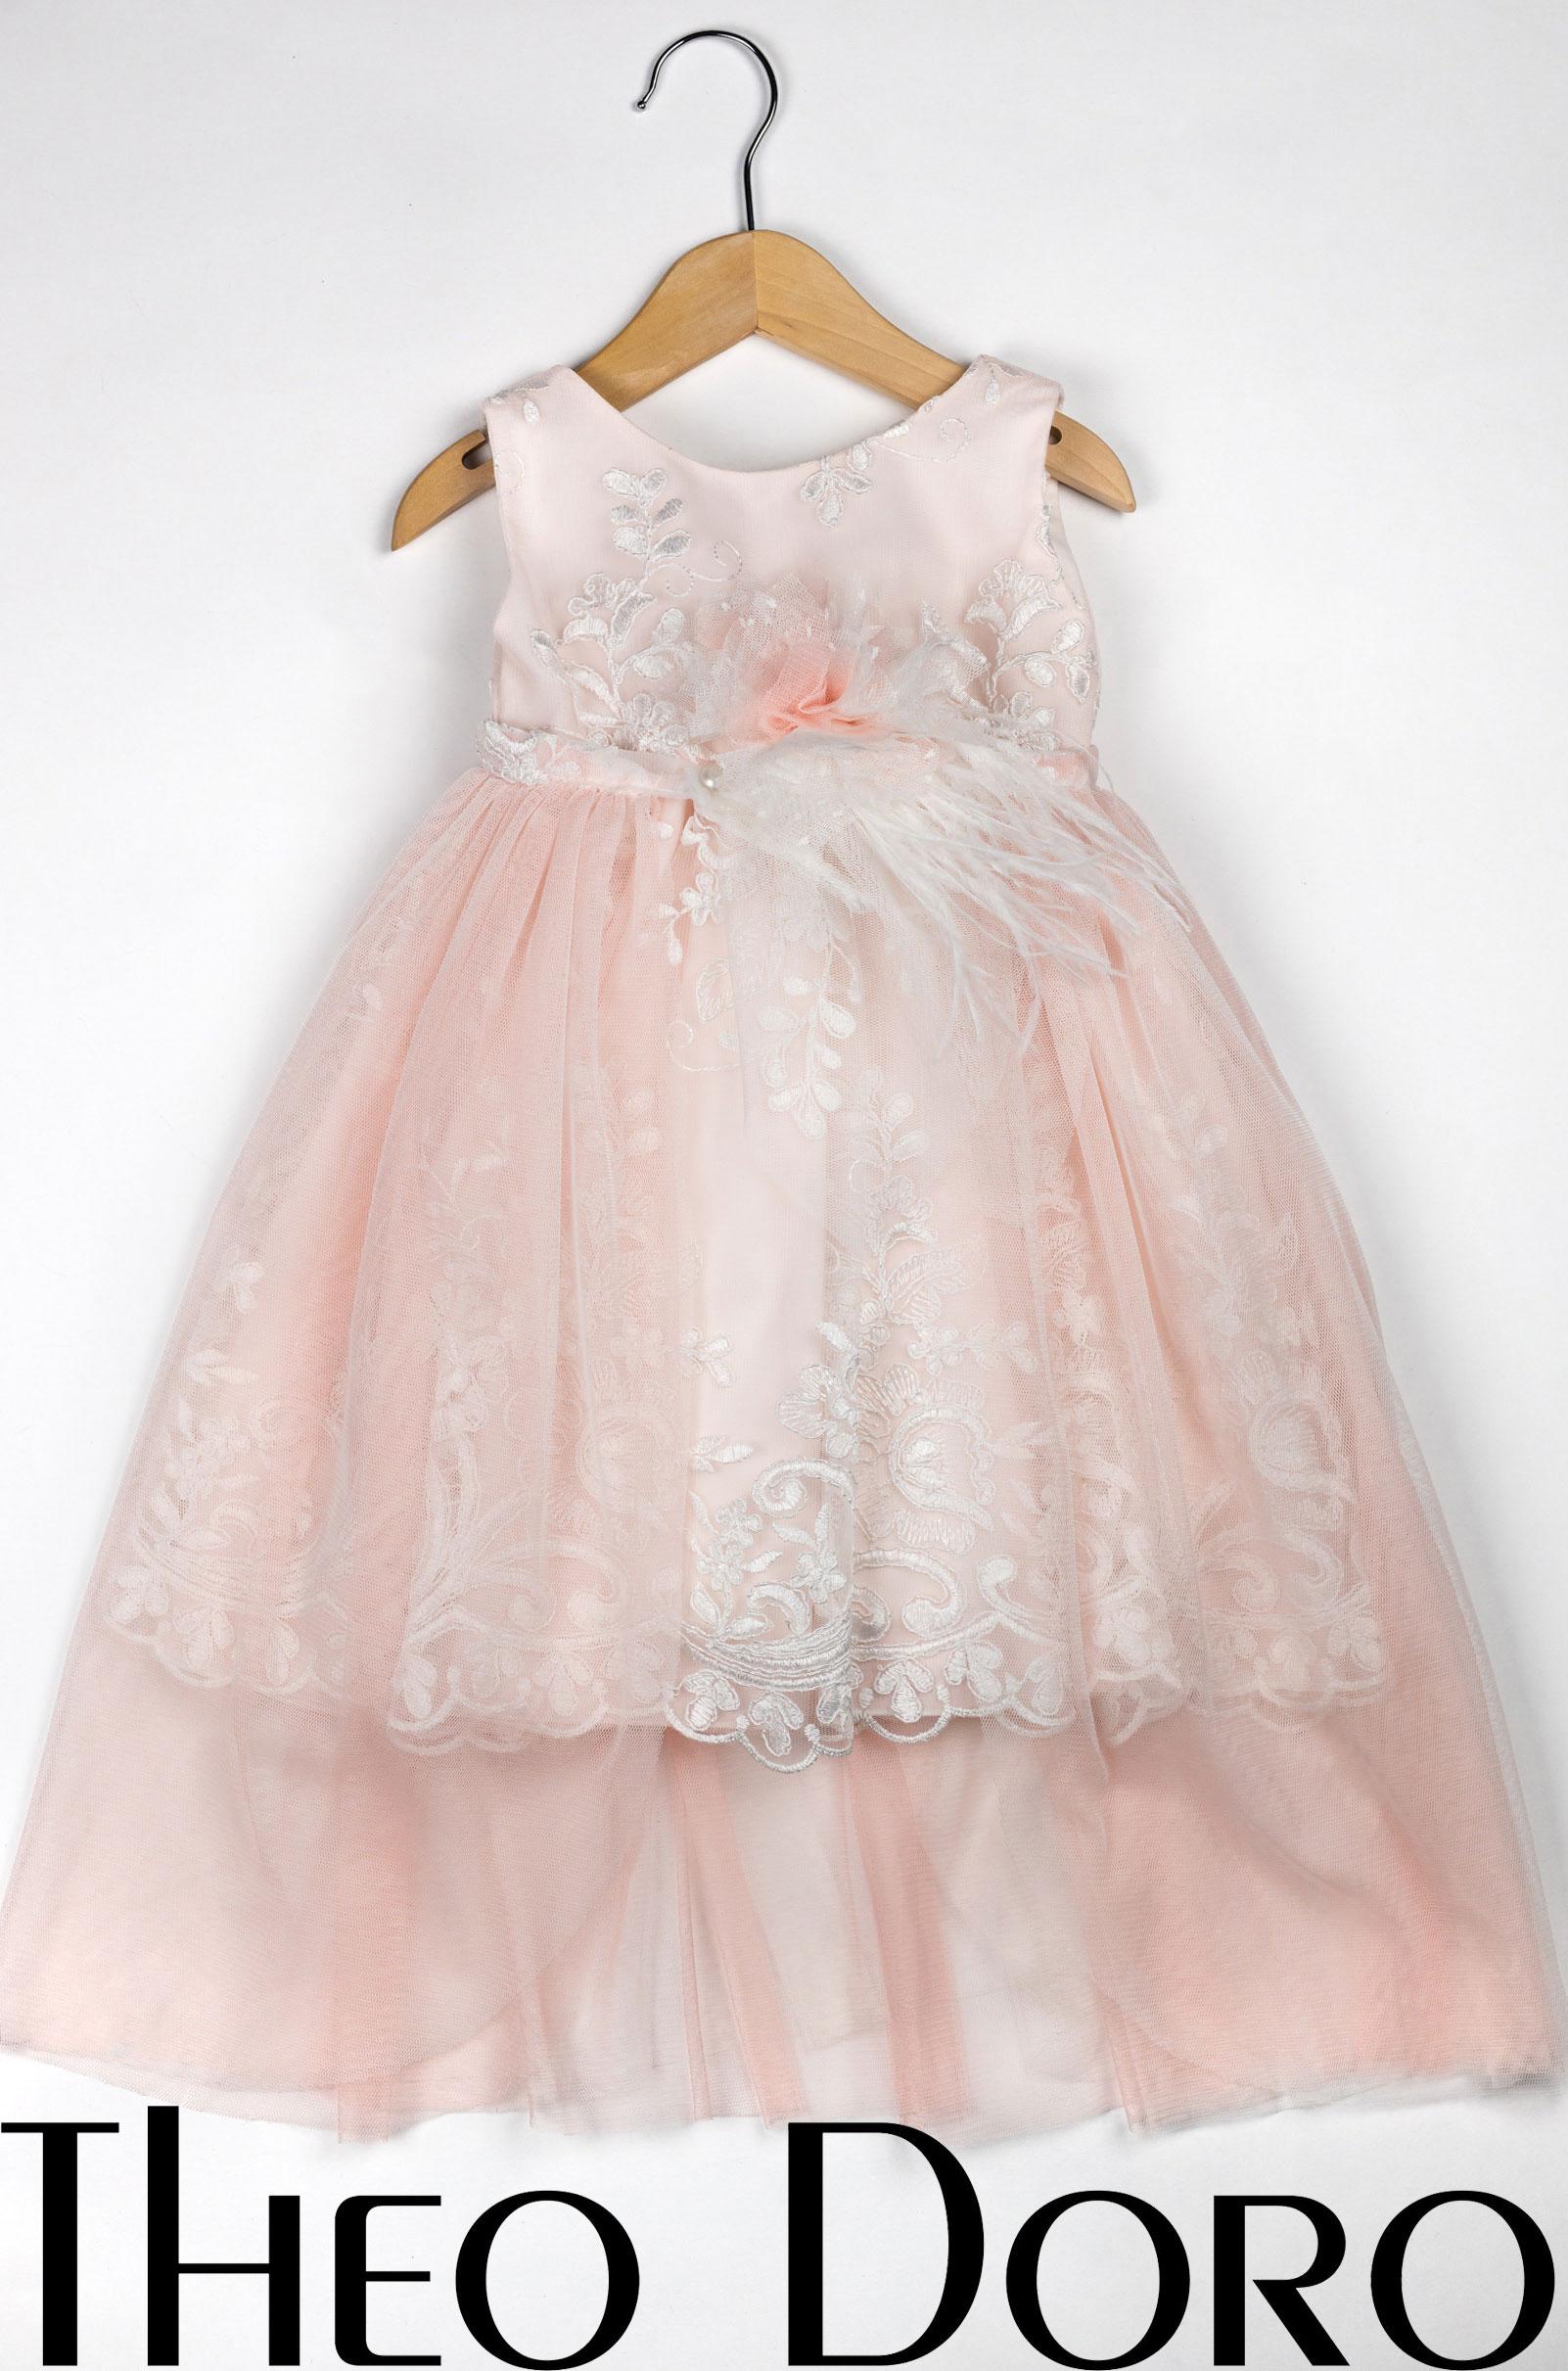 Baby Girl Light Pink Stunning Lace Floral Baptismal Dress